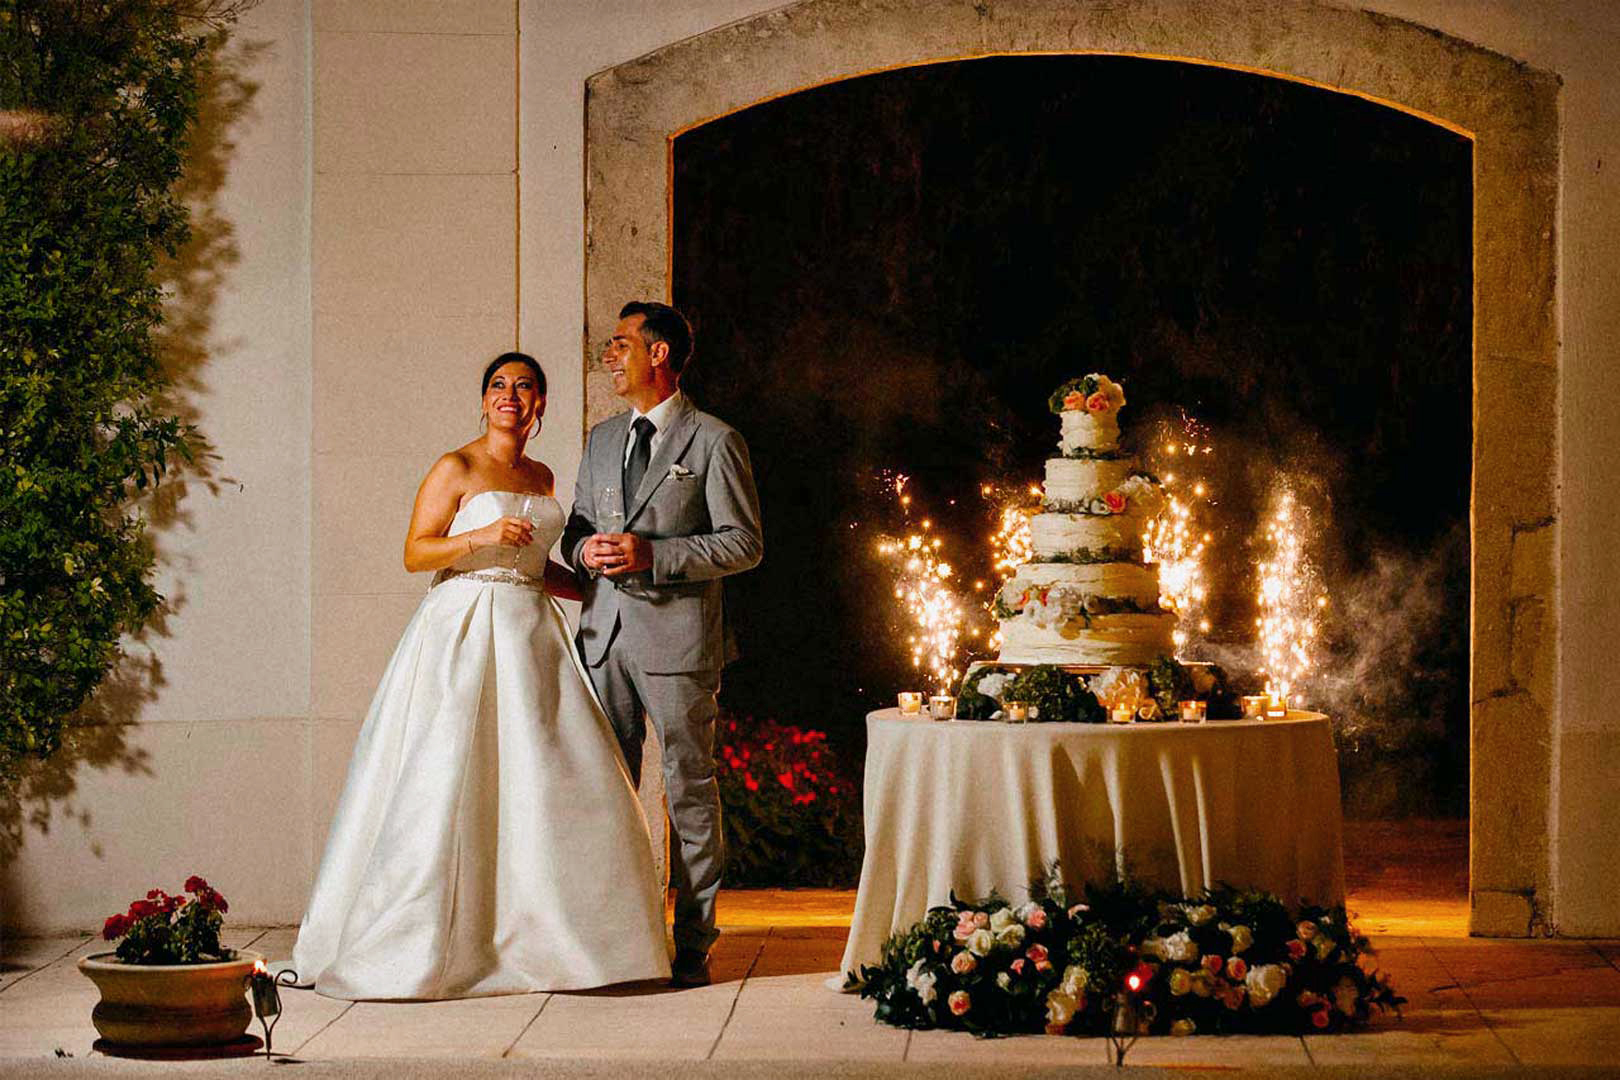 028-torta-nunziale-gianni-lepore-fotografo-matrimonio